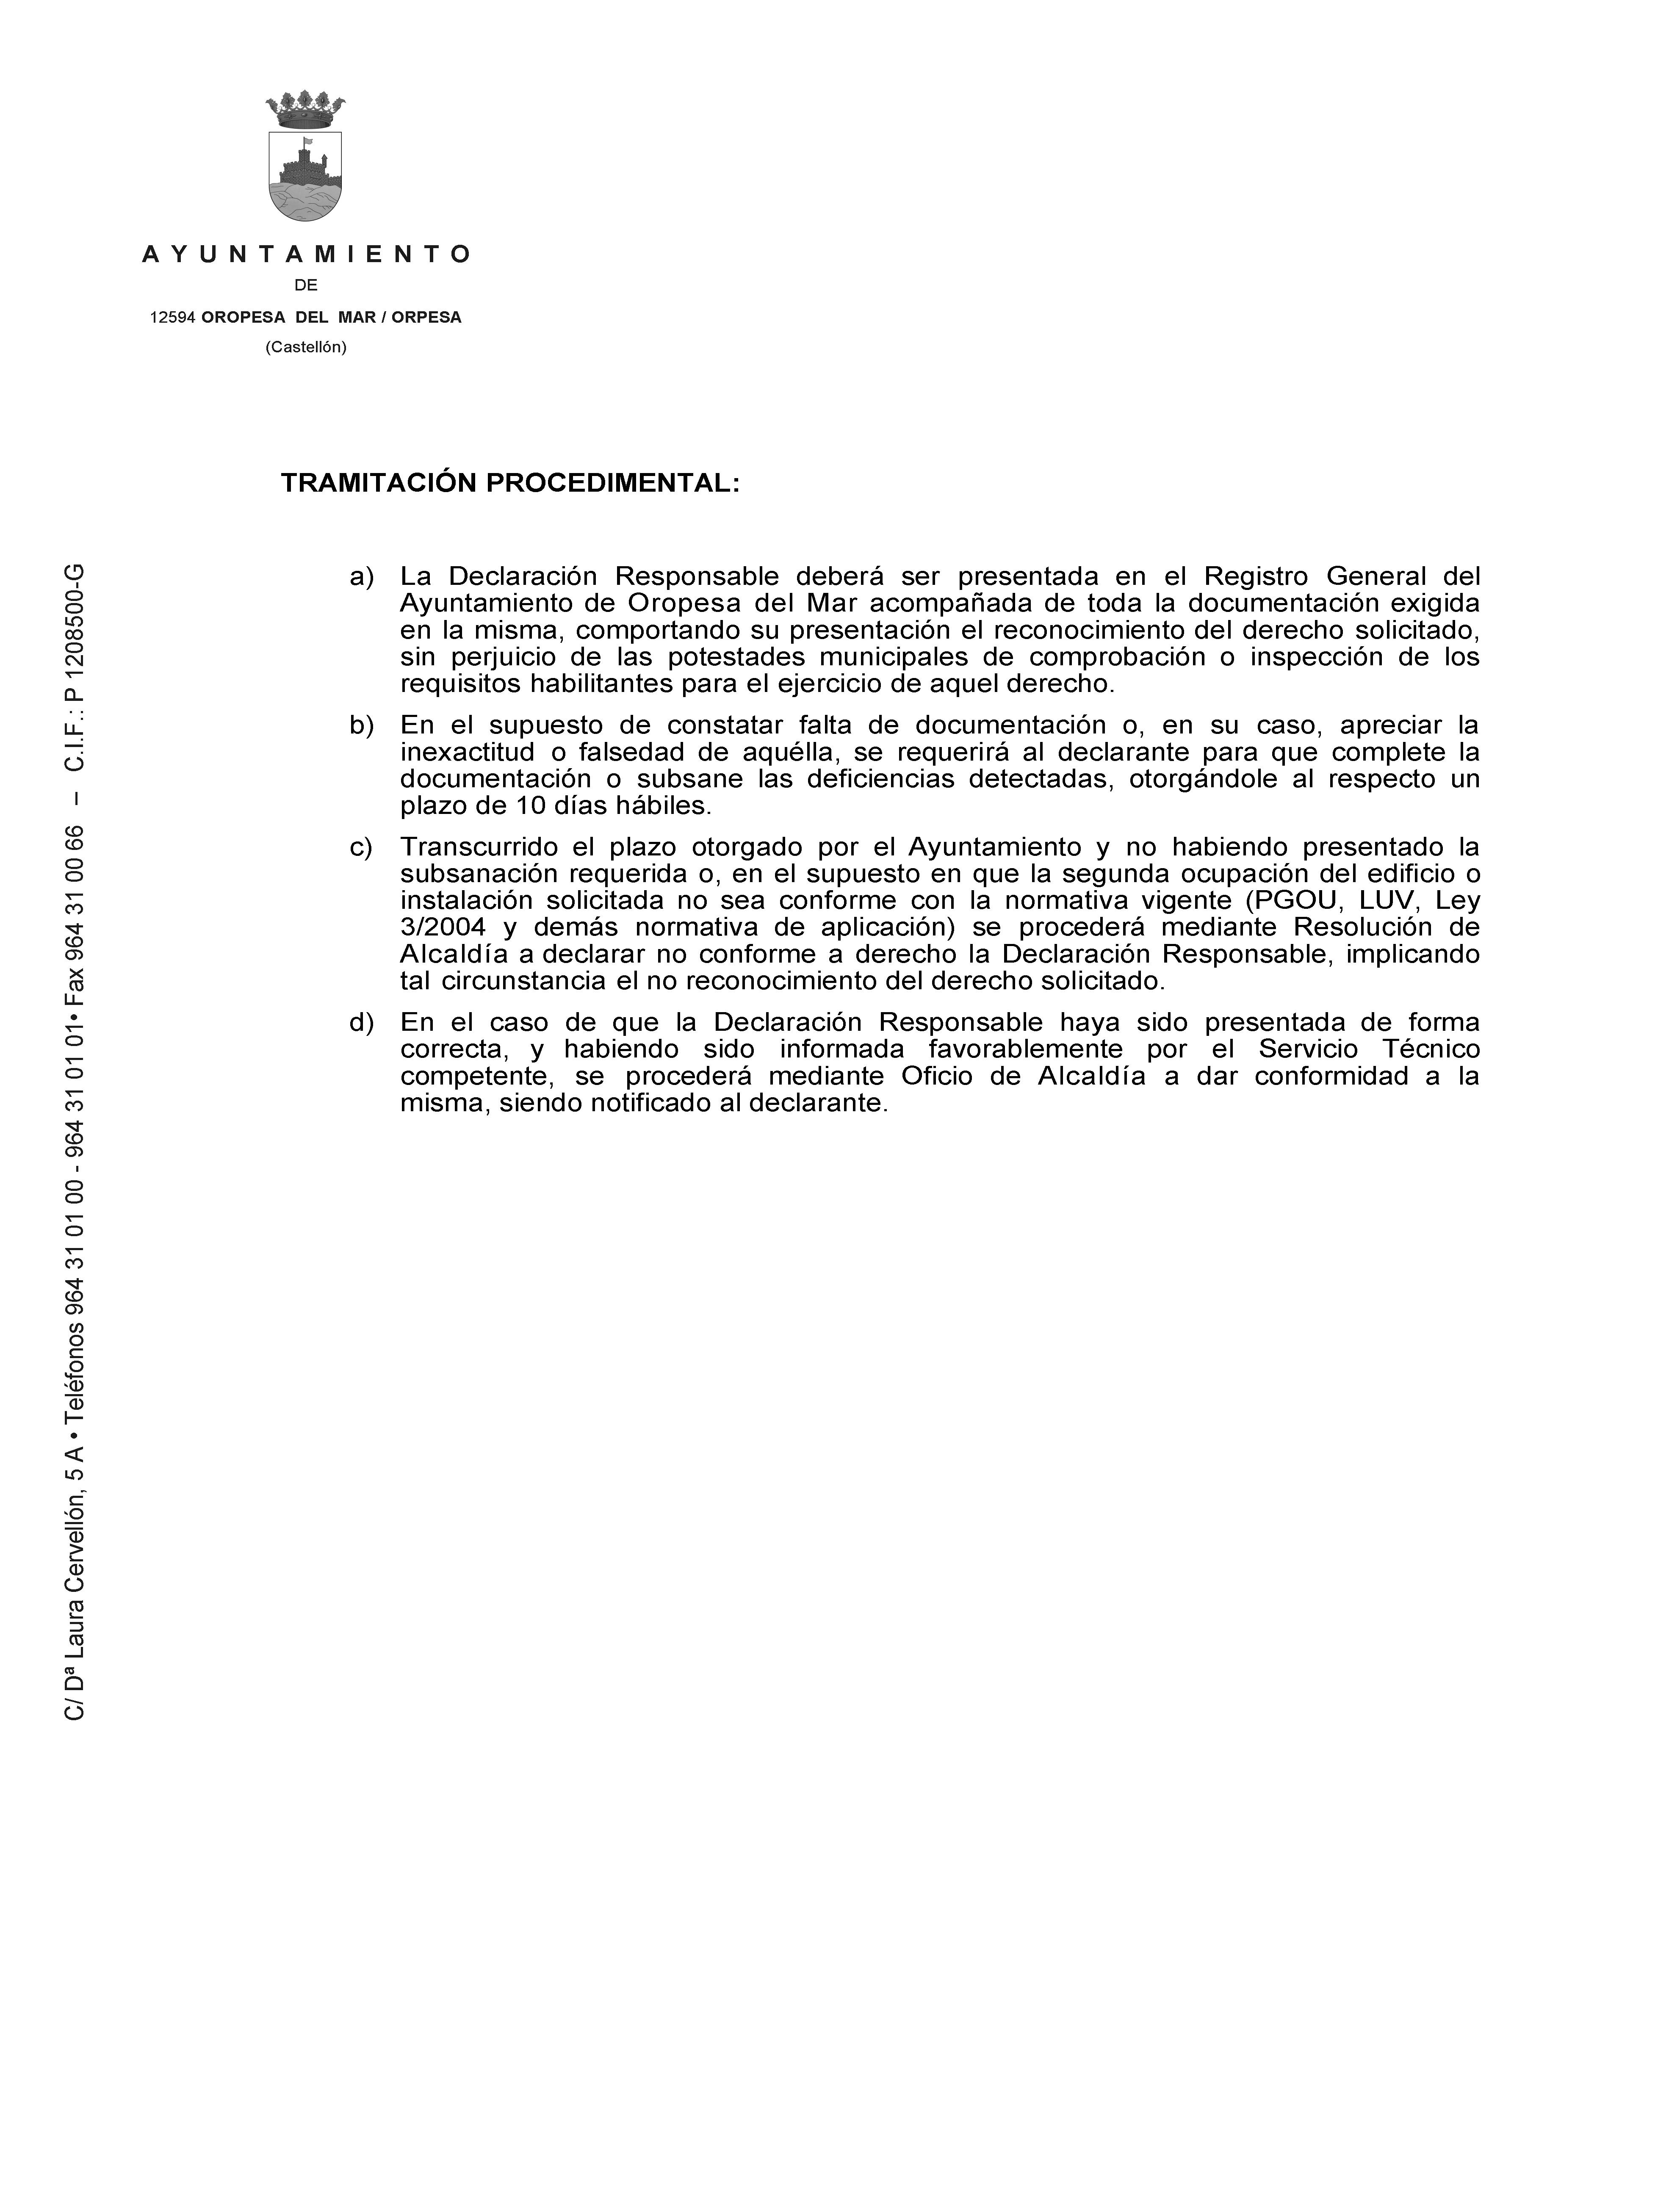 Impreso Declaración Responsable Segunda Ocupación Oropesa del Mar/Orpesa